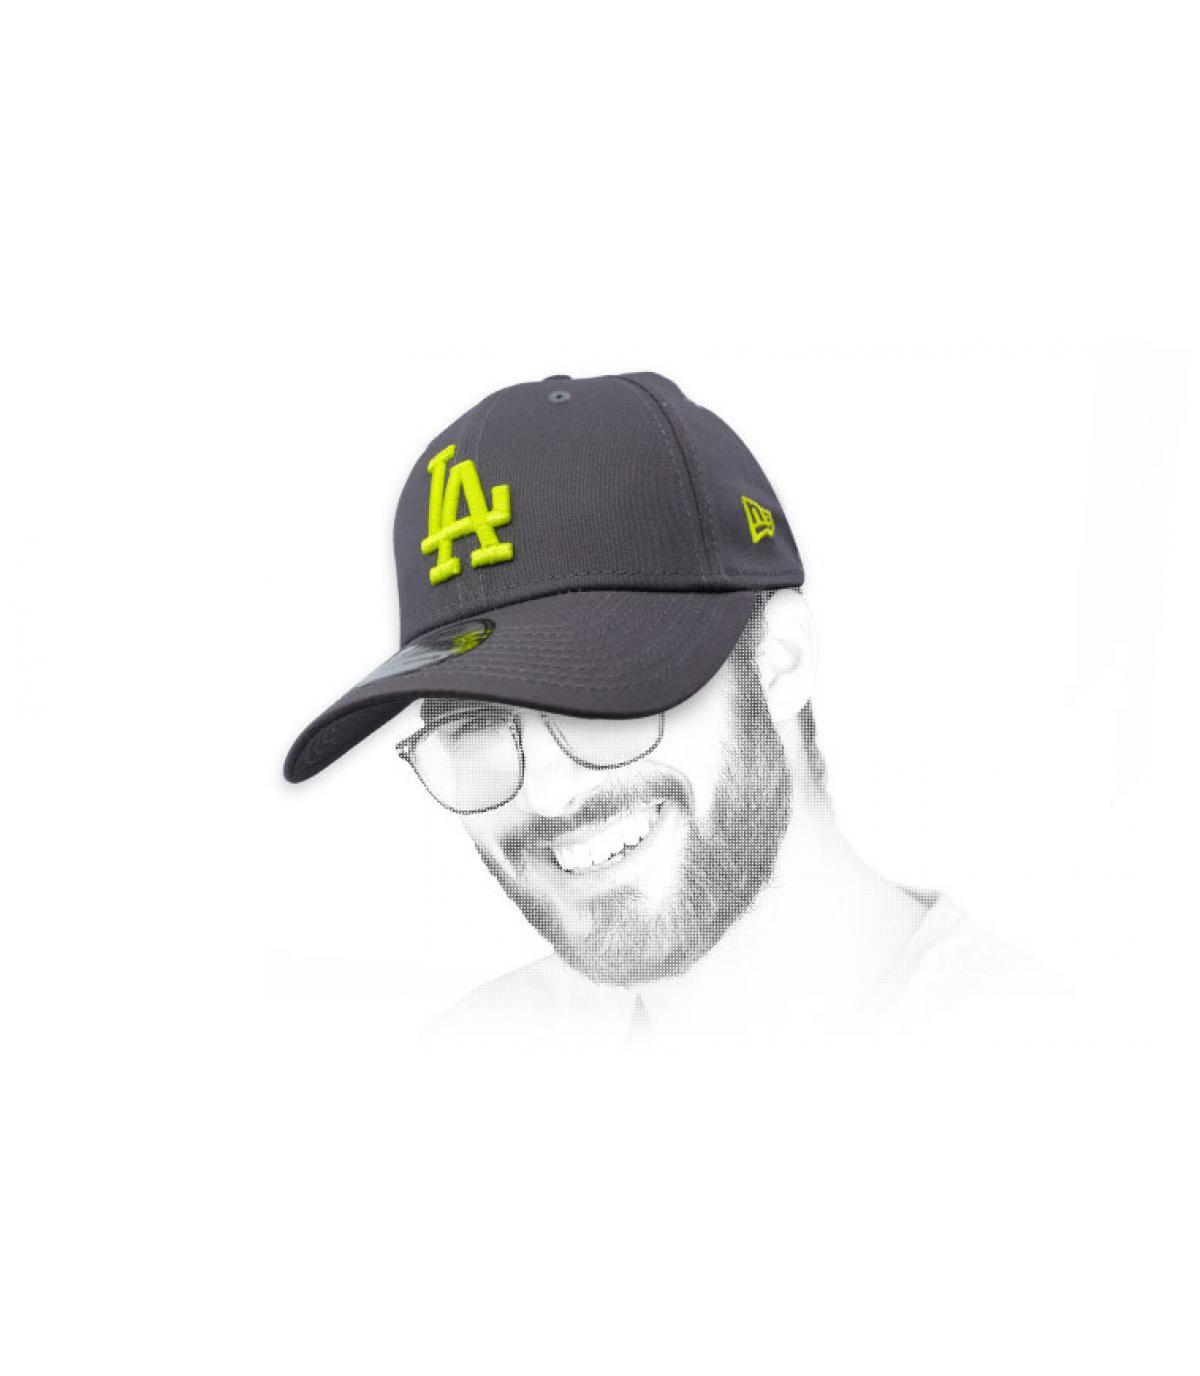 gorra LA gris amarillo